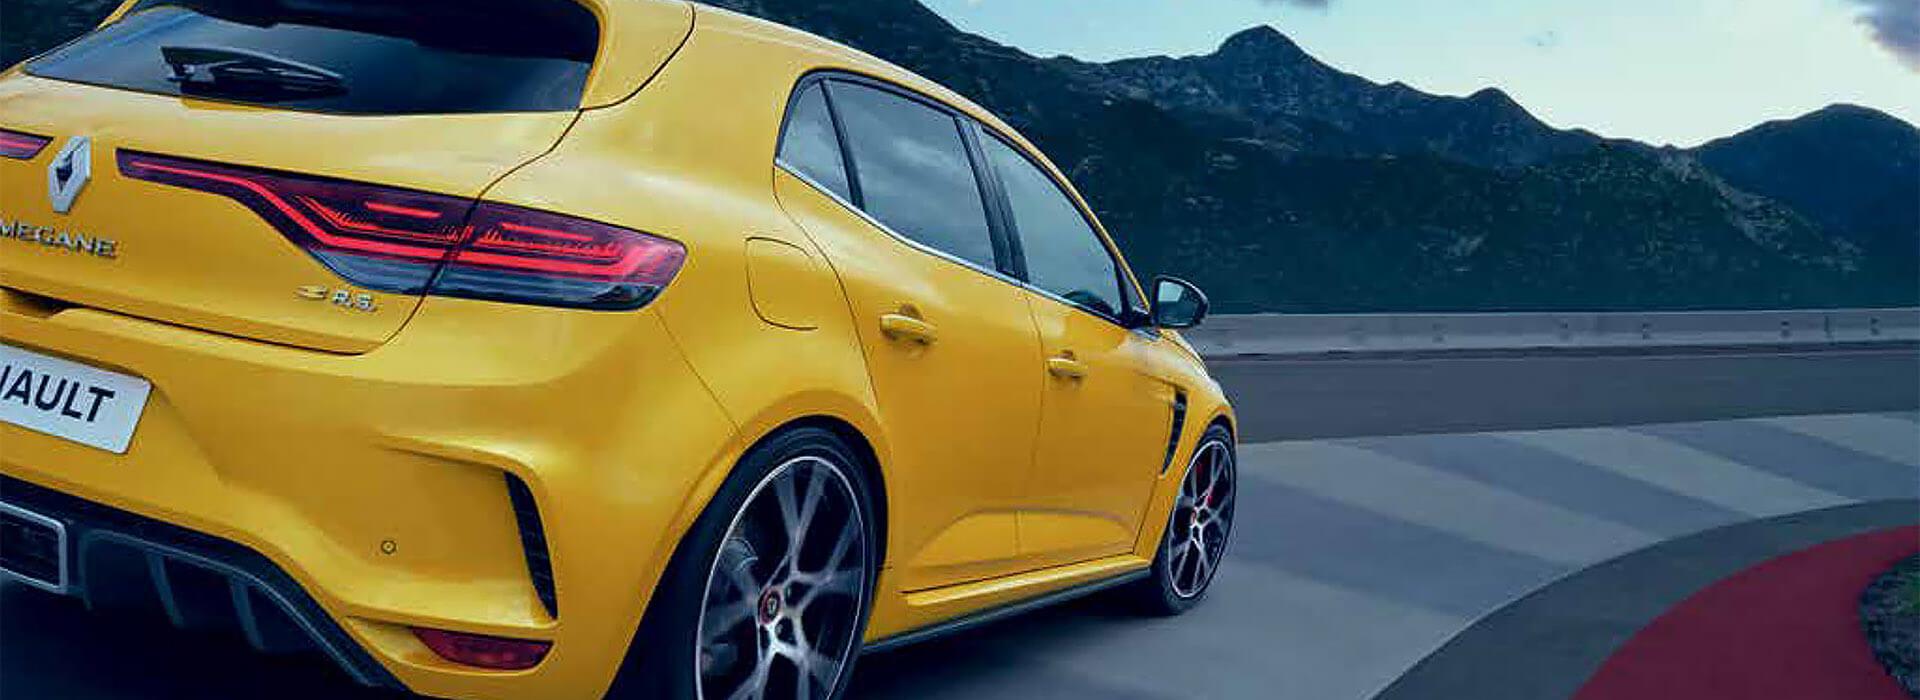 DC Motors Renault Careers